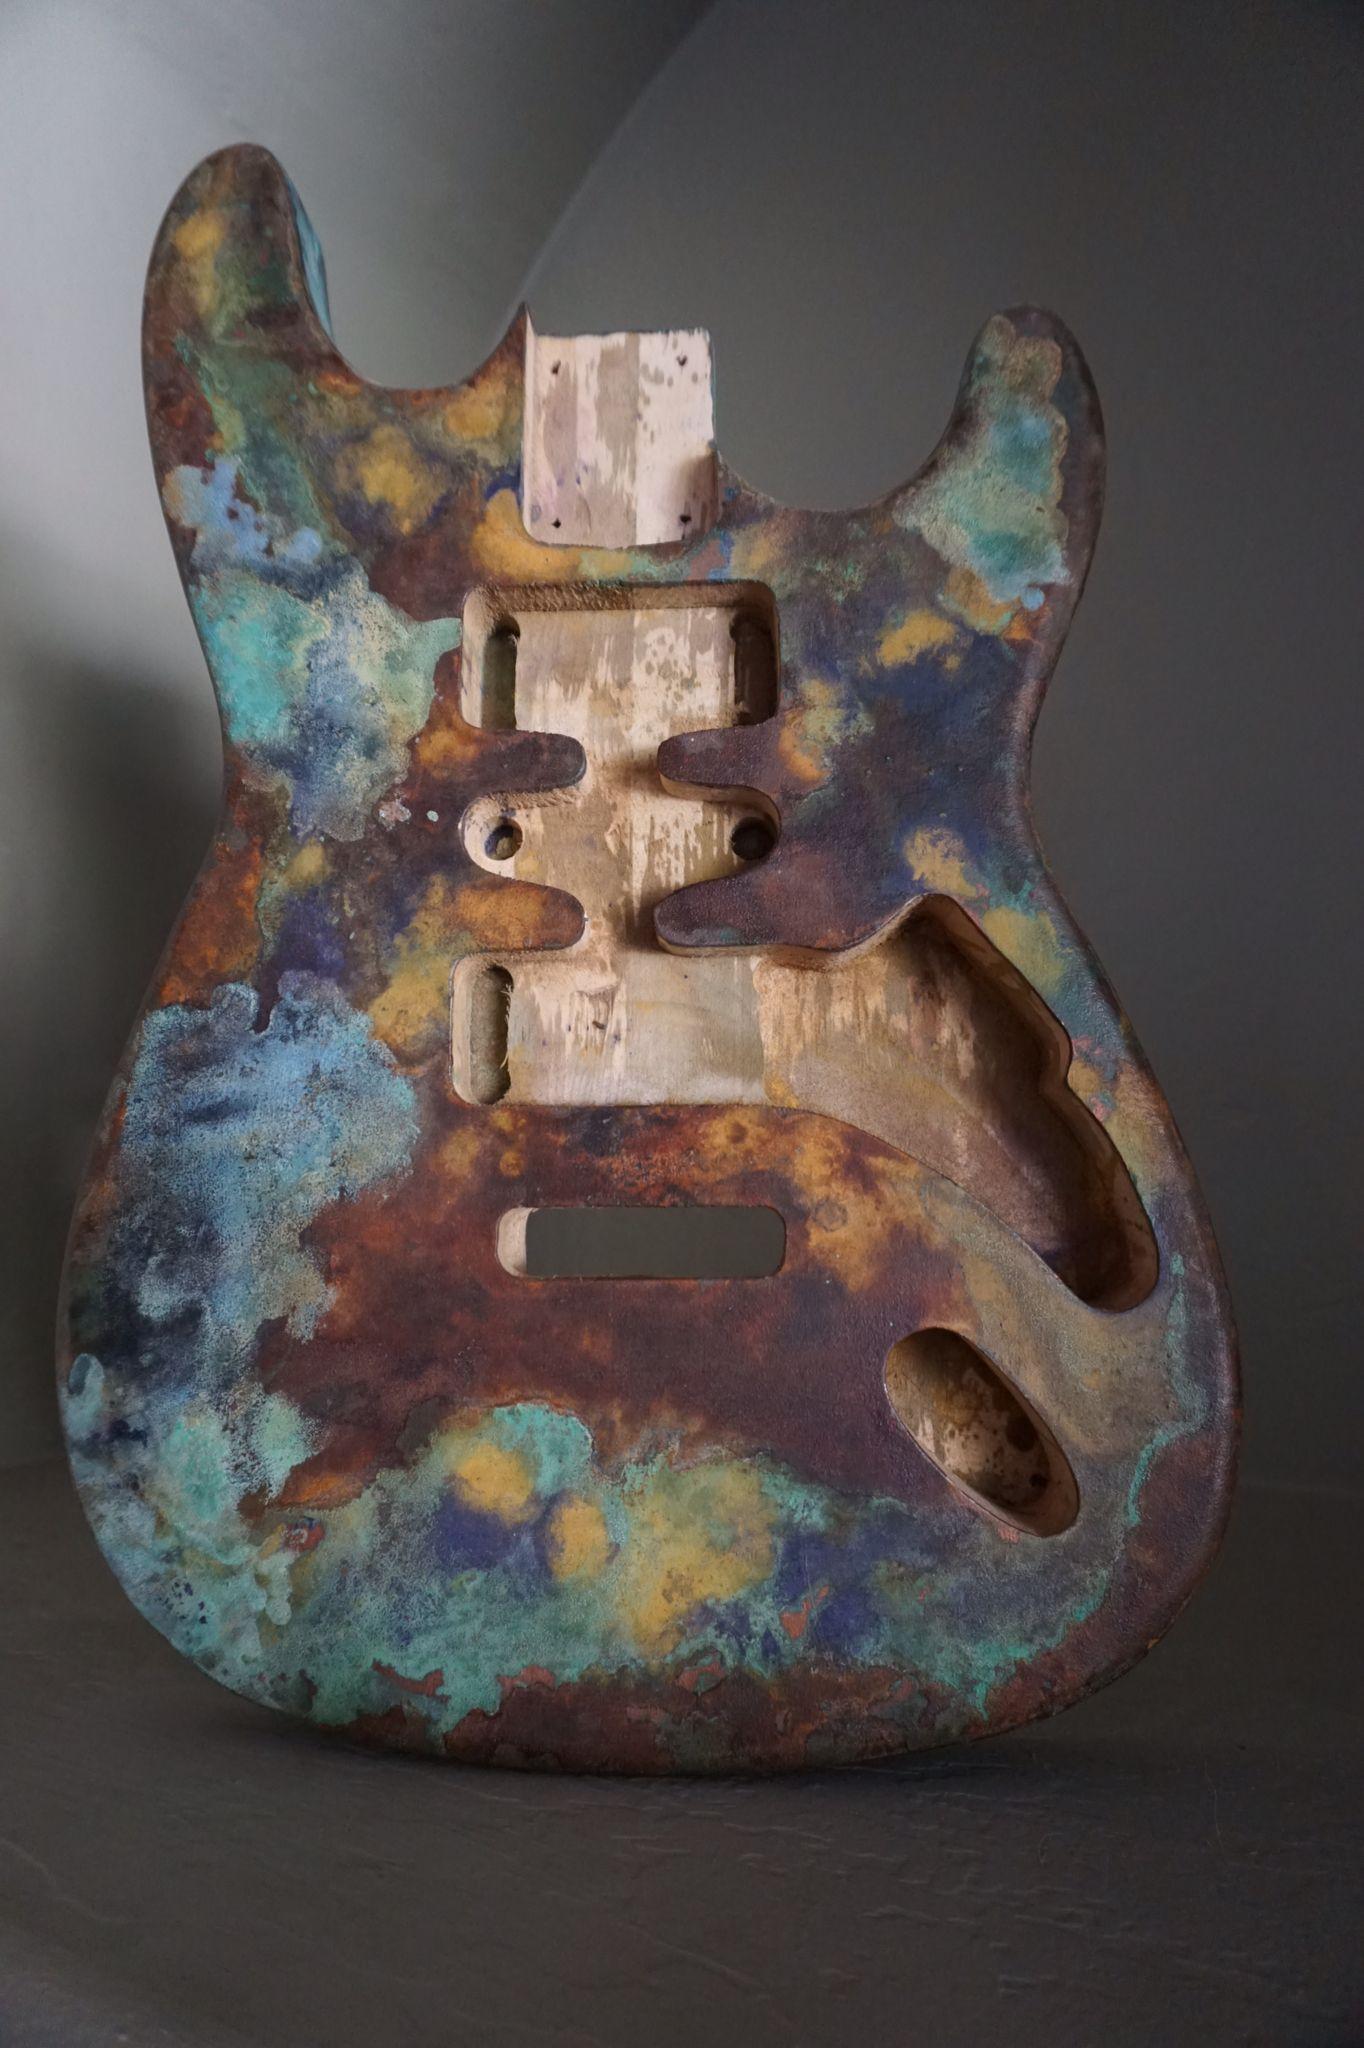 Oxidized Rust Metal Effect Www Promusicianslist Com Guitar Diy Guitar Art Guitar Painting